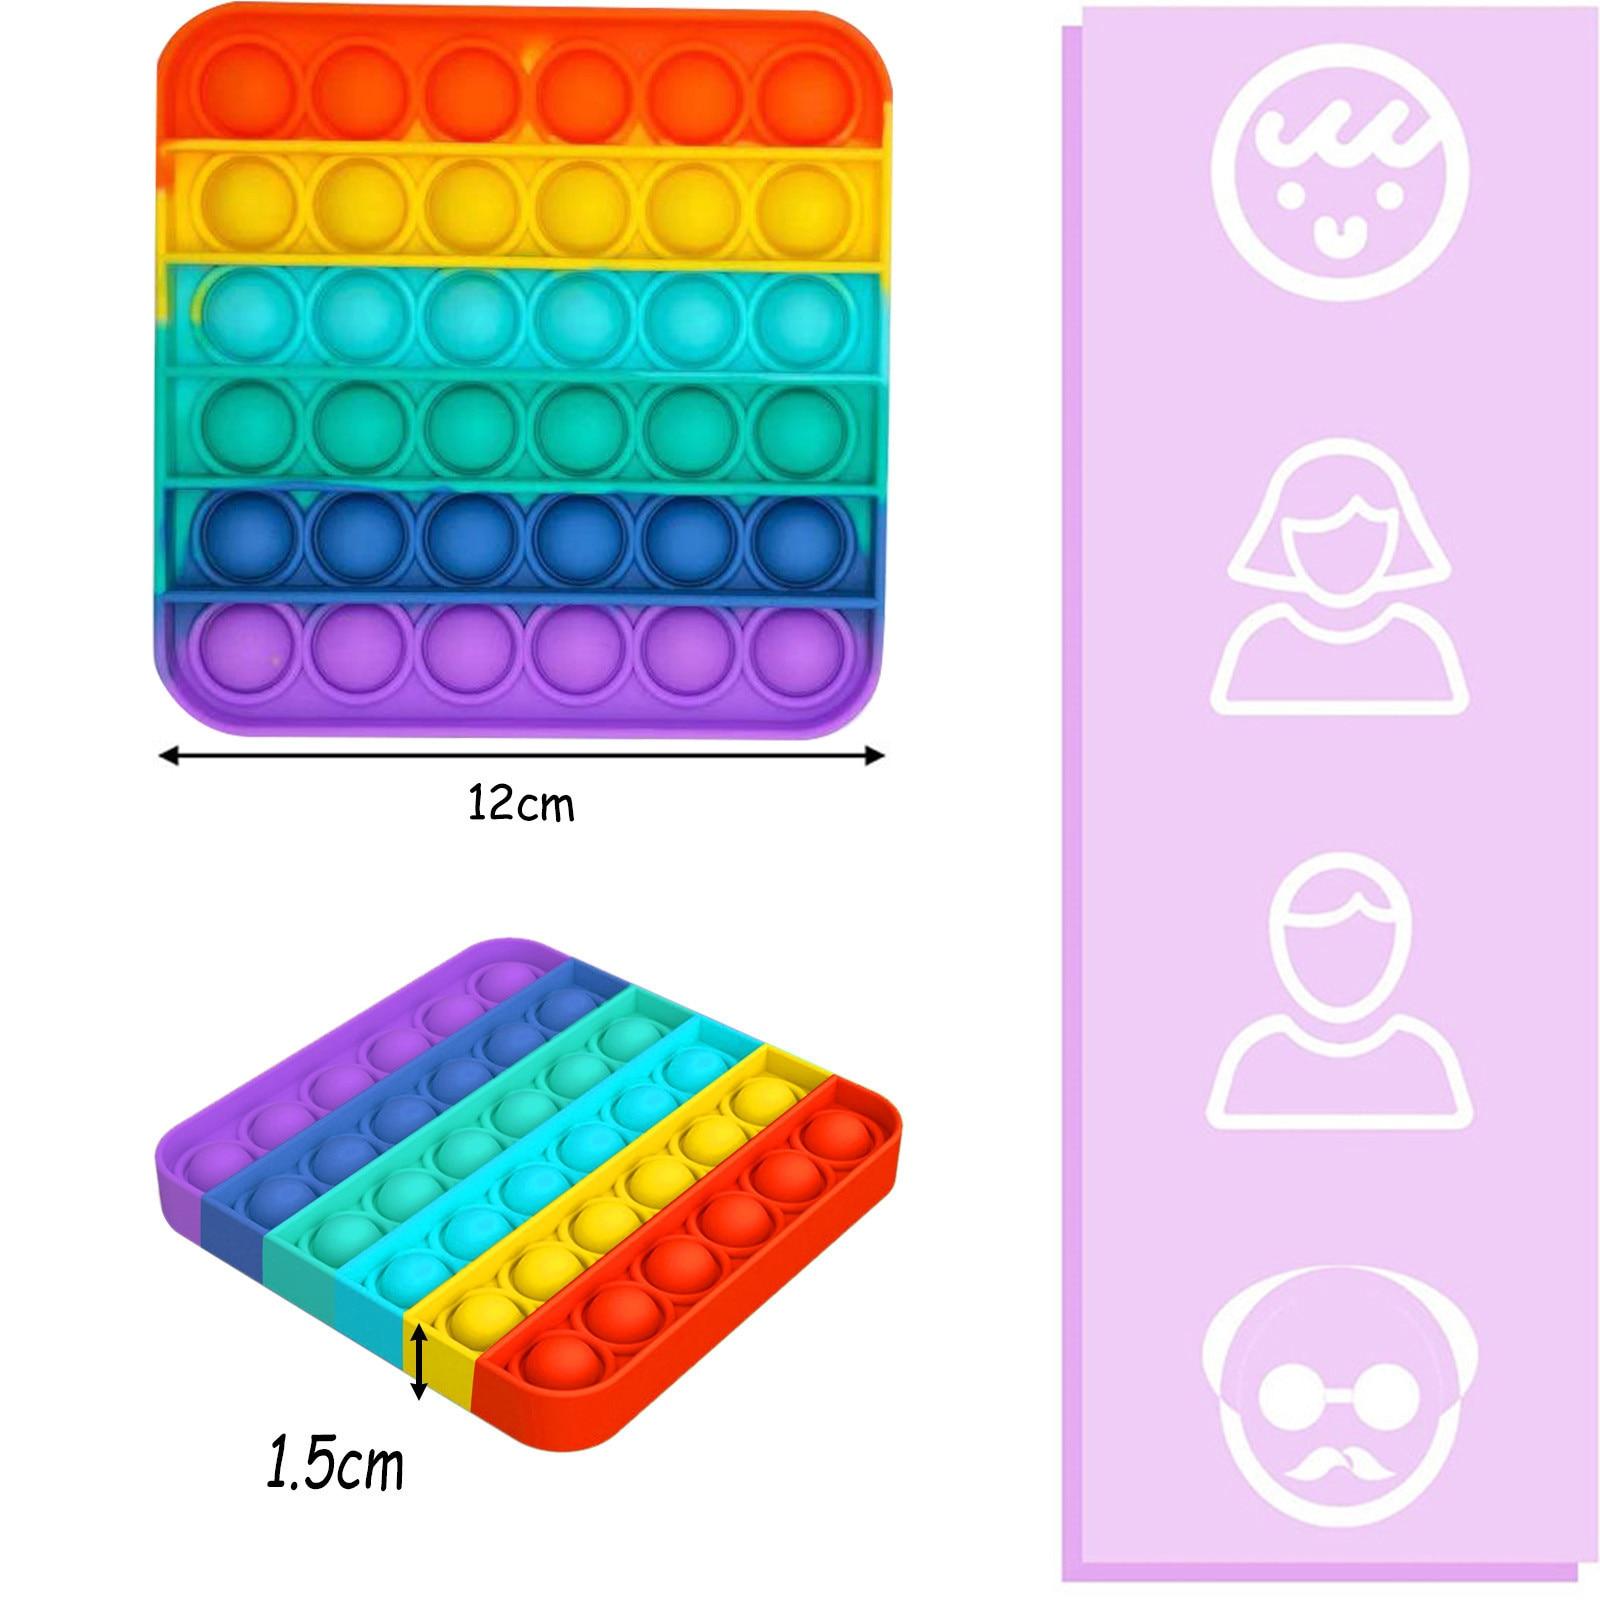 25 Pcs Fidges Fidget Toy Set Cheap Sensory Fidget Toys Pack for Kids or Adults Squishy img3